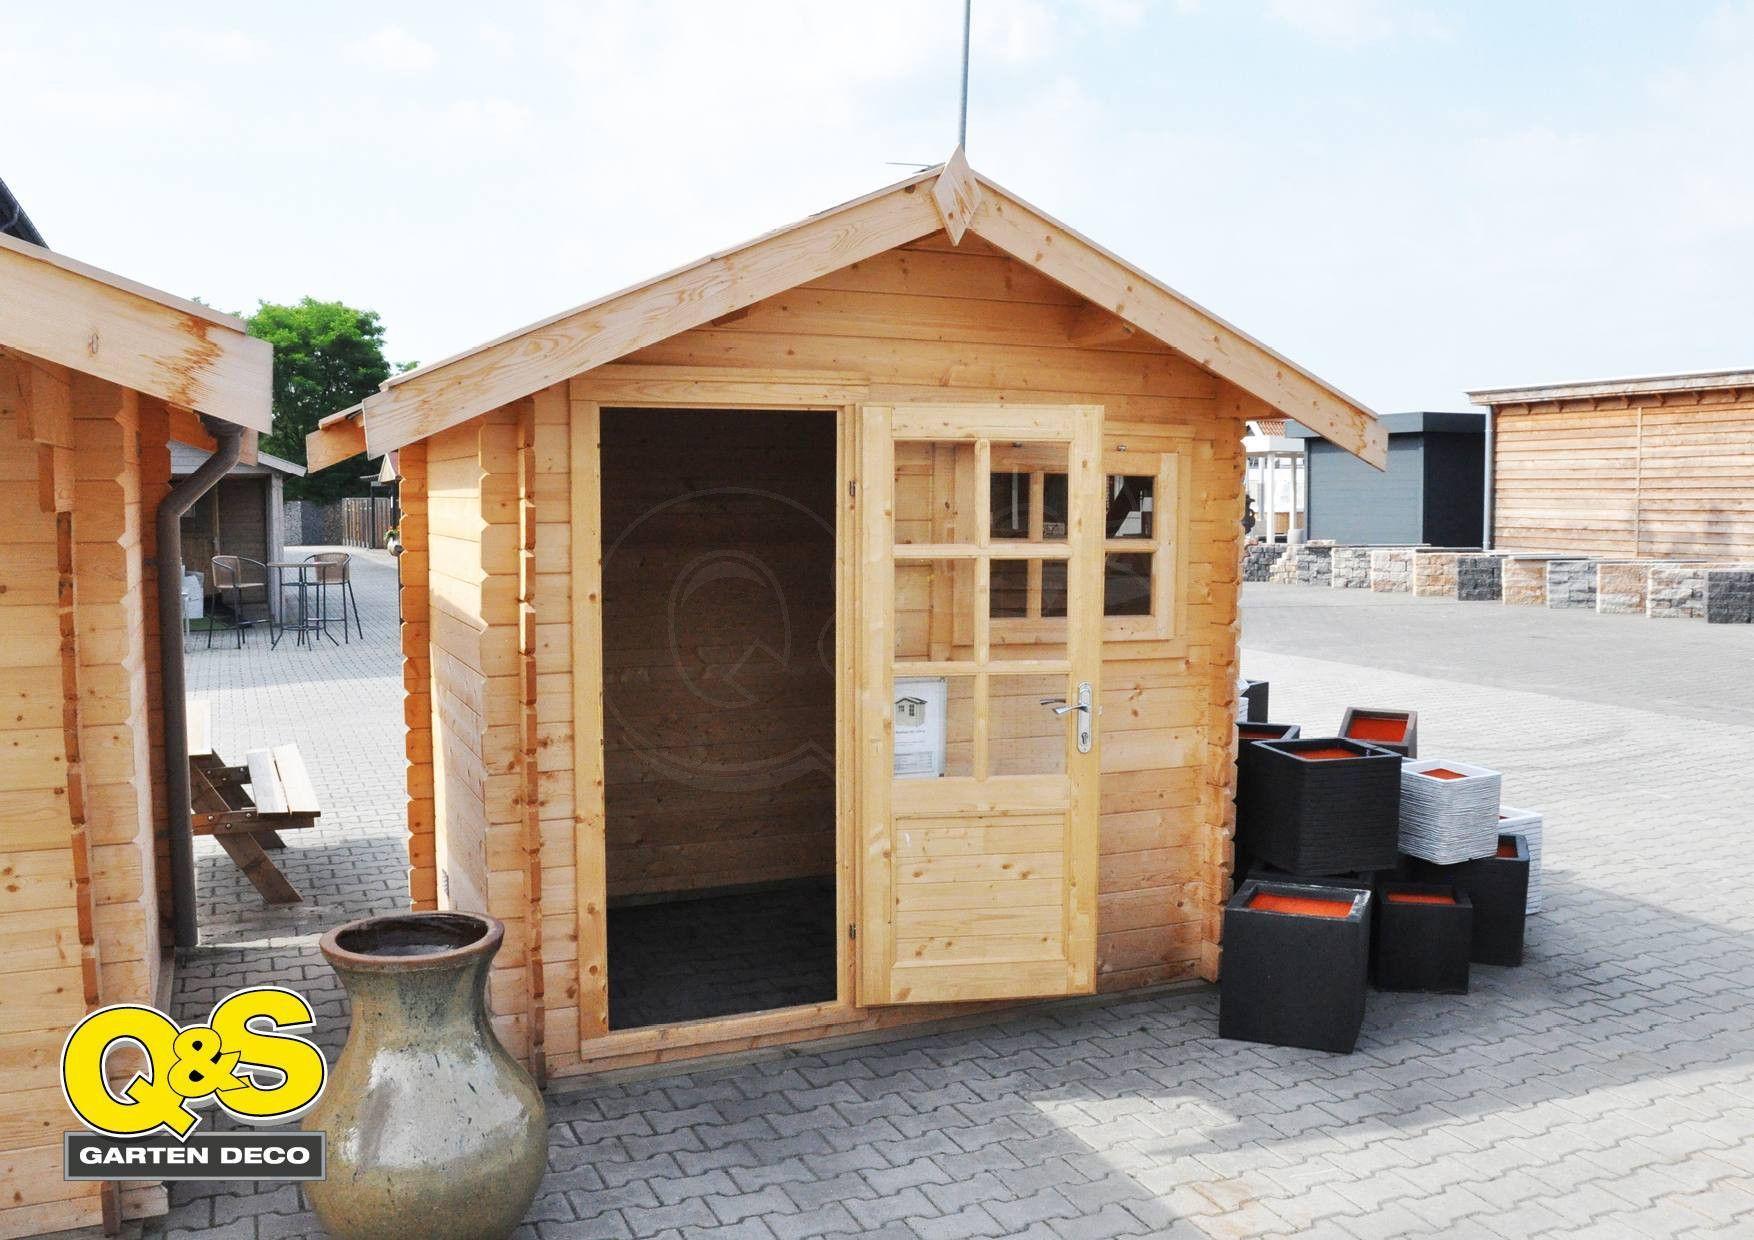 q&s meppen gardenhouses meppen houten #blokhut xcm bij q&s